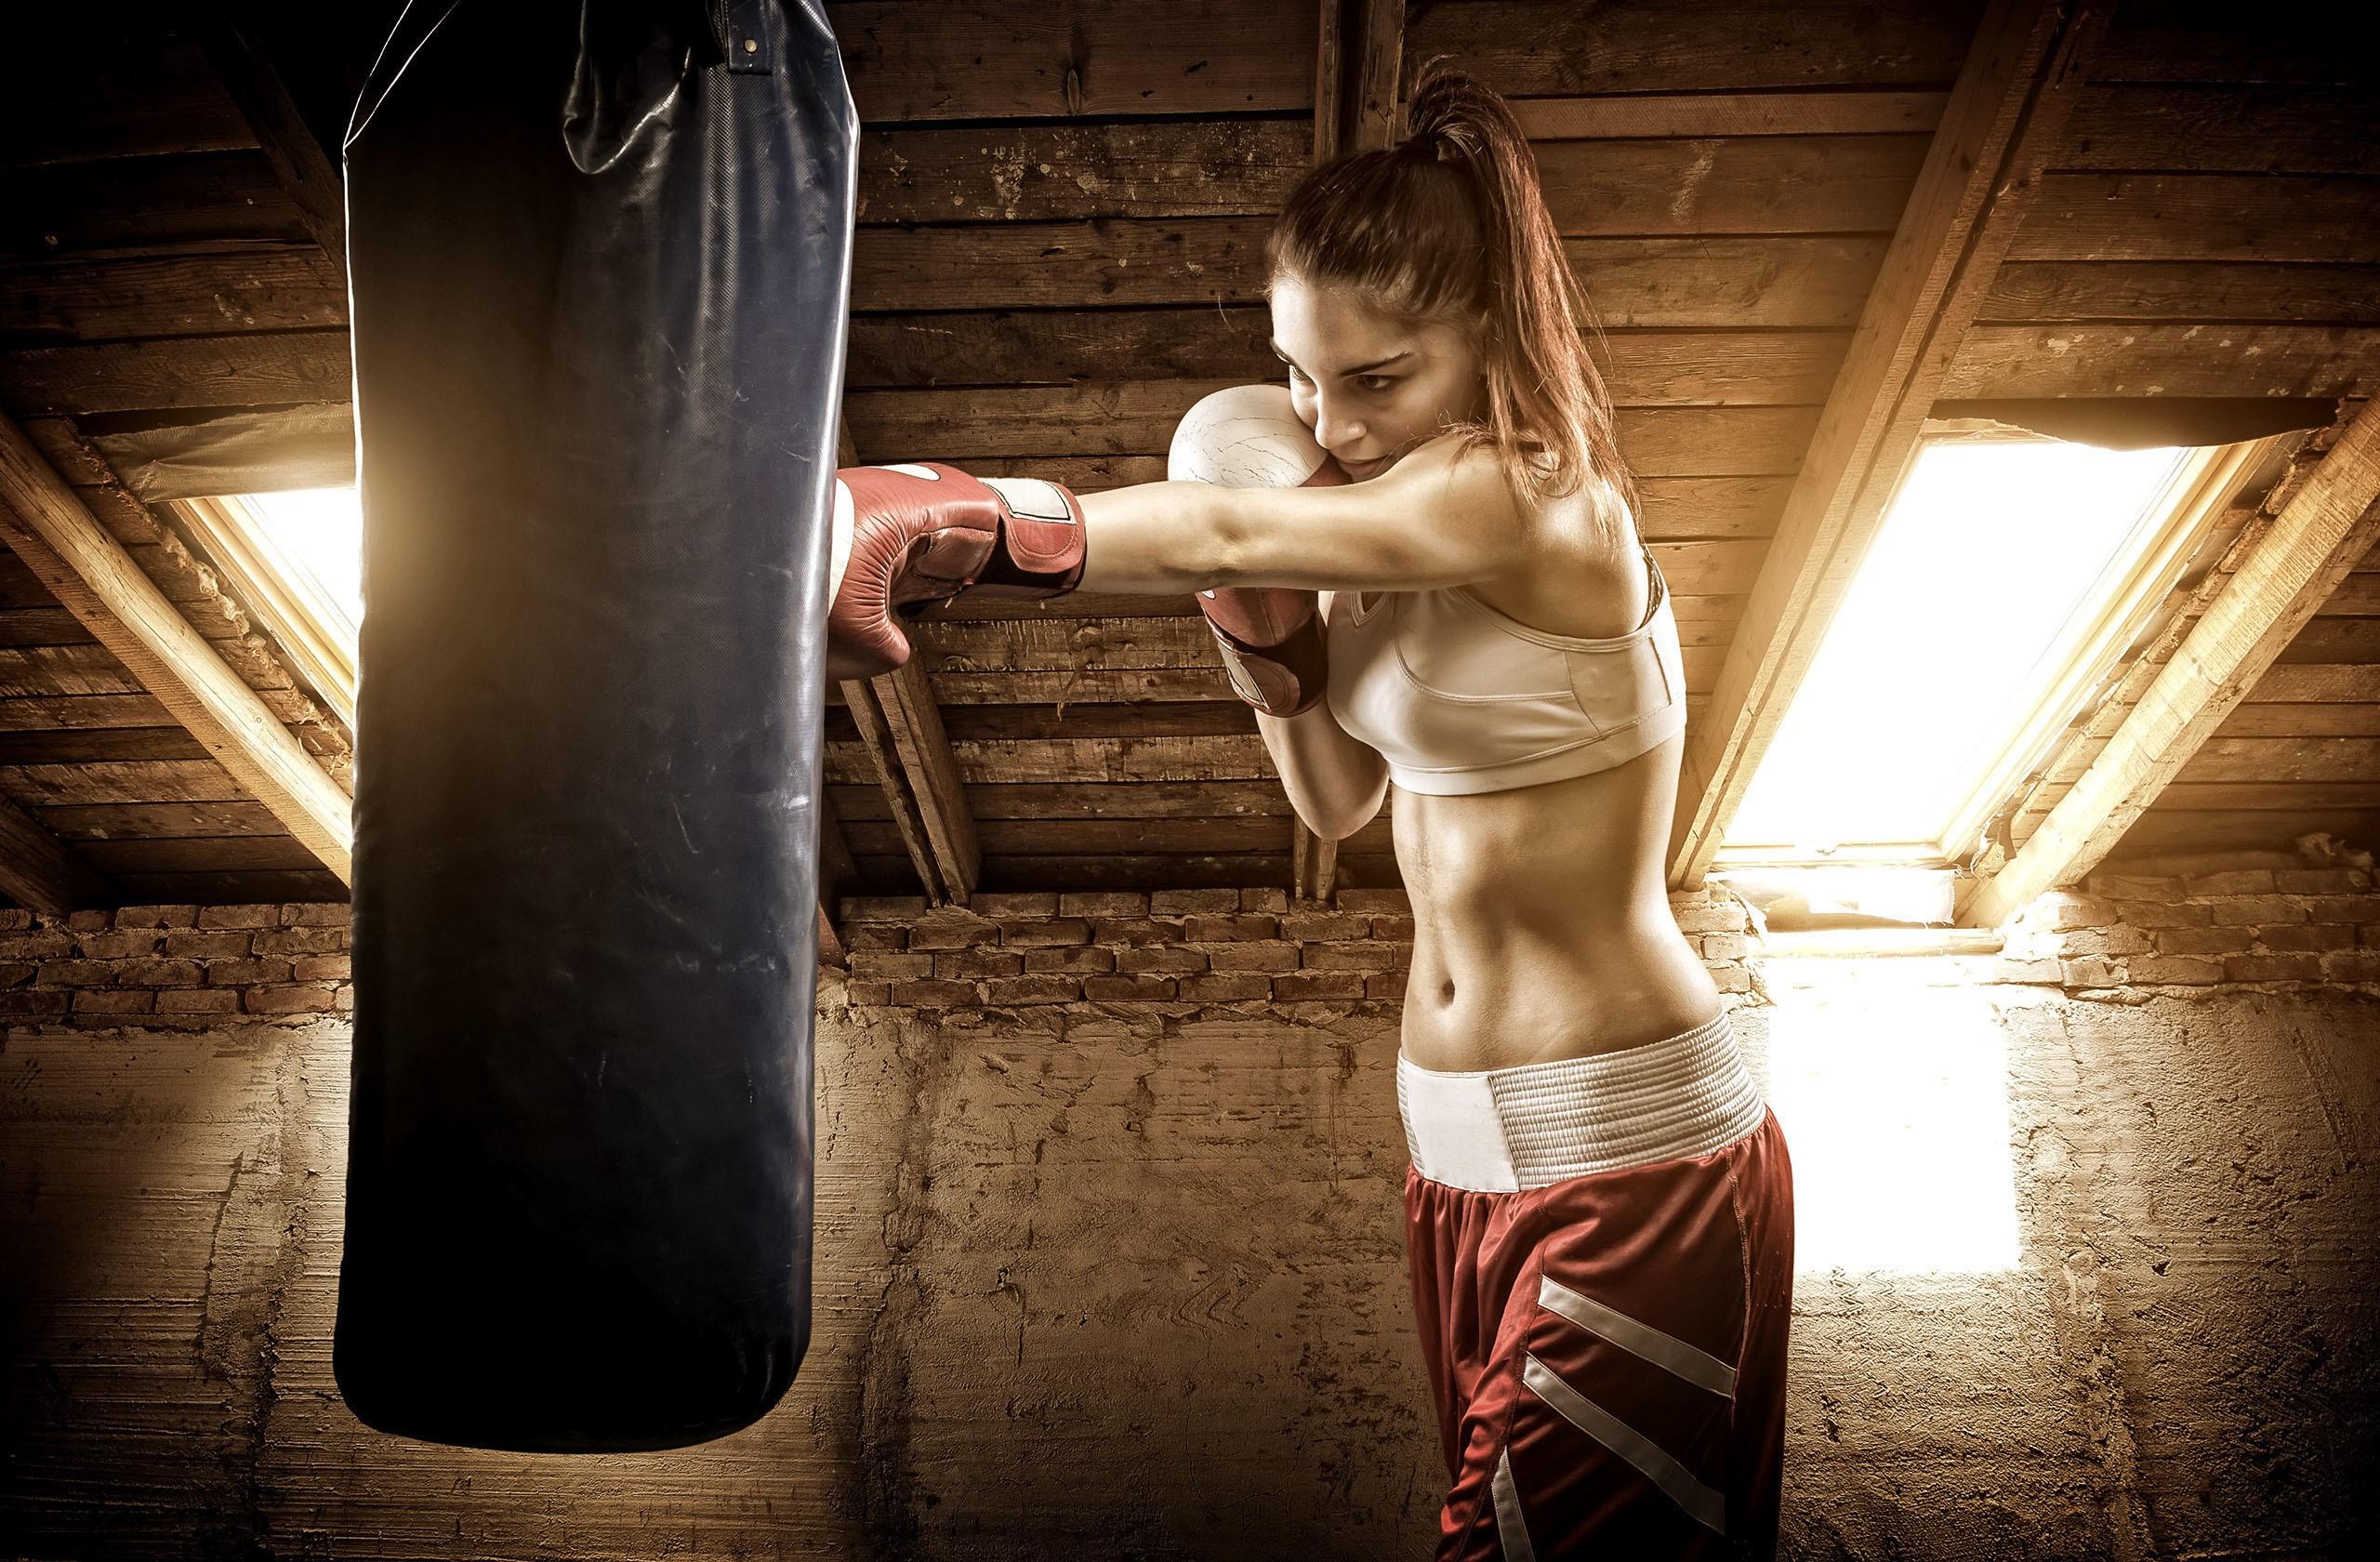 Boxing: Girl, Brunette, Woman, Ponytail, Boxing, Athlete